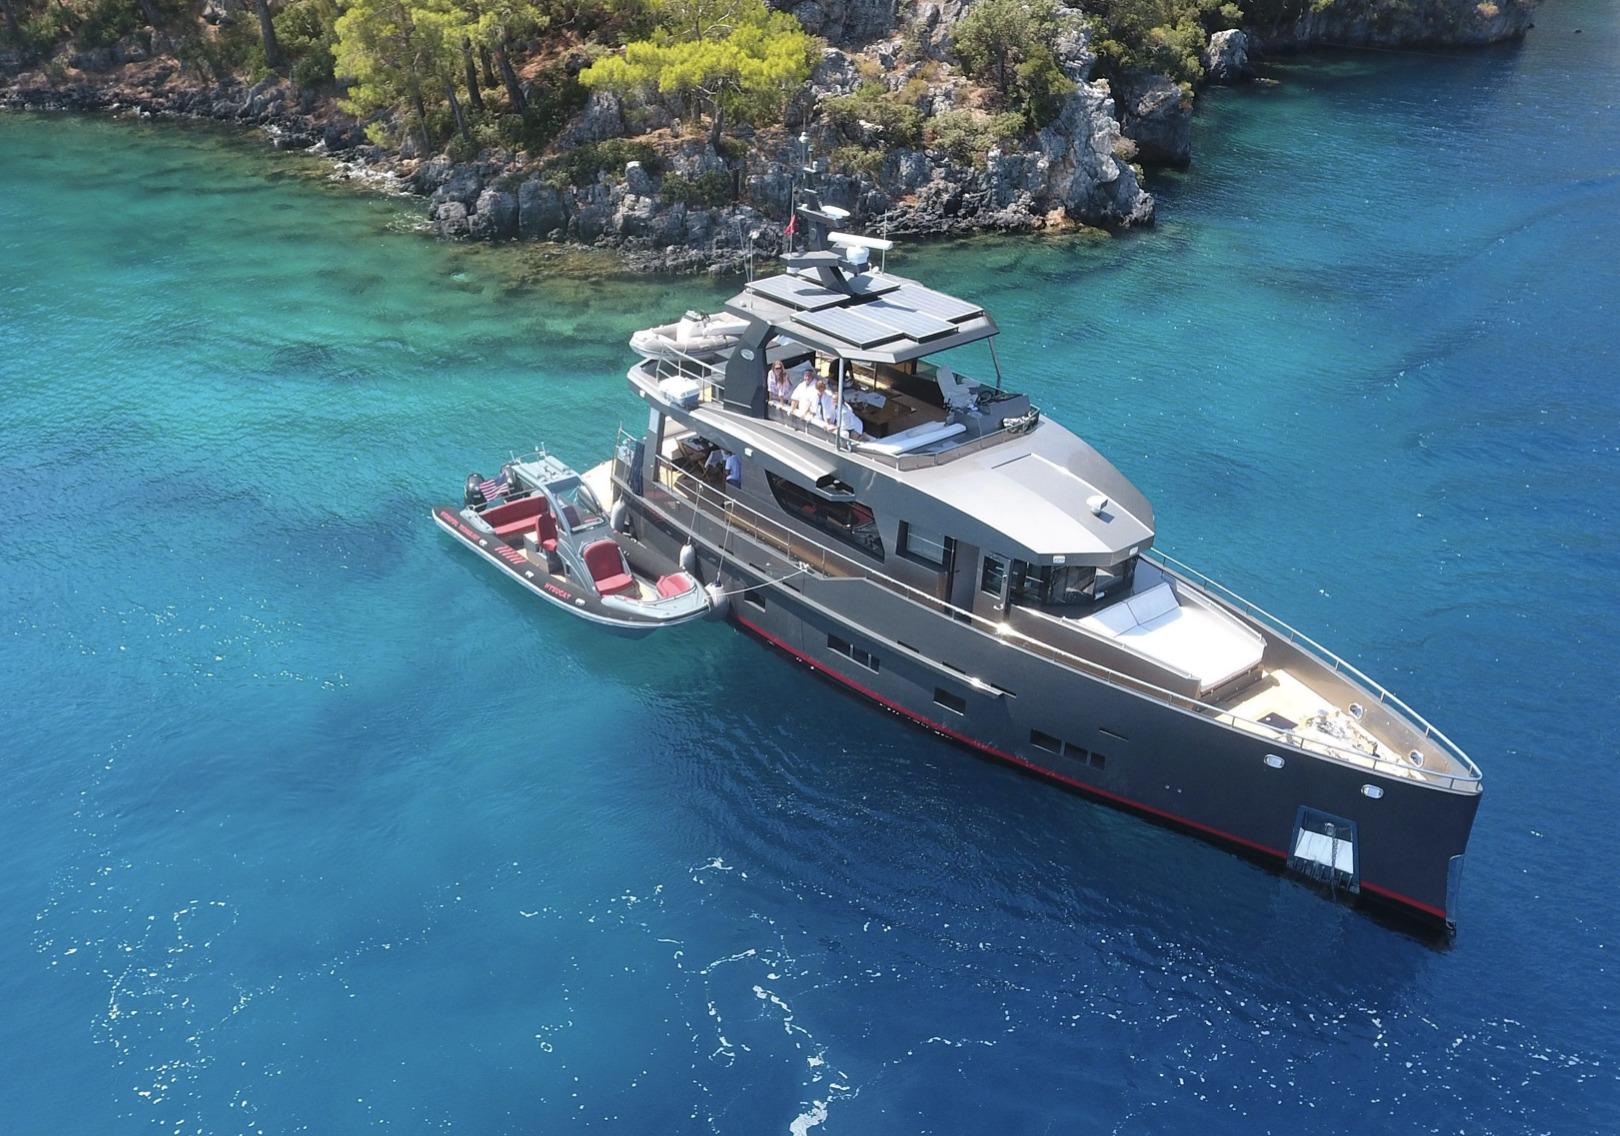 bering-70-and-hysucat-cruise-turkey-west-coast